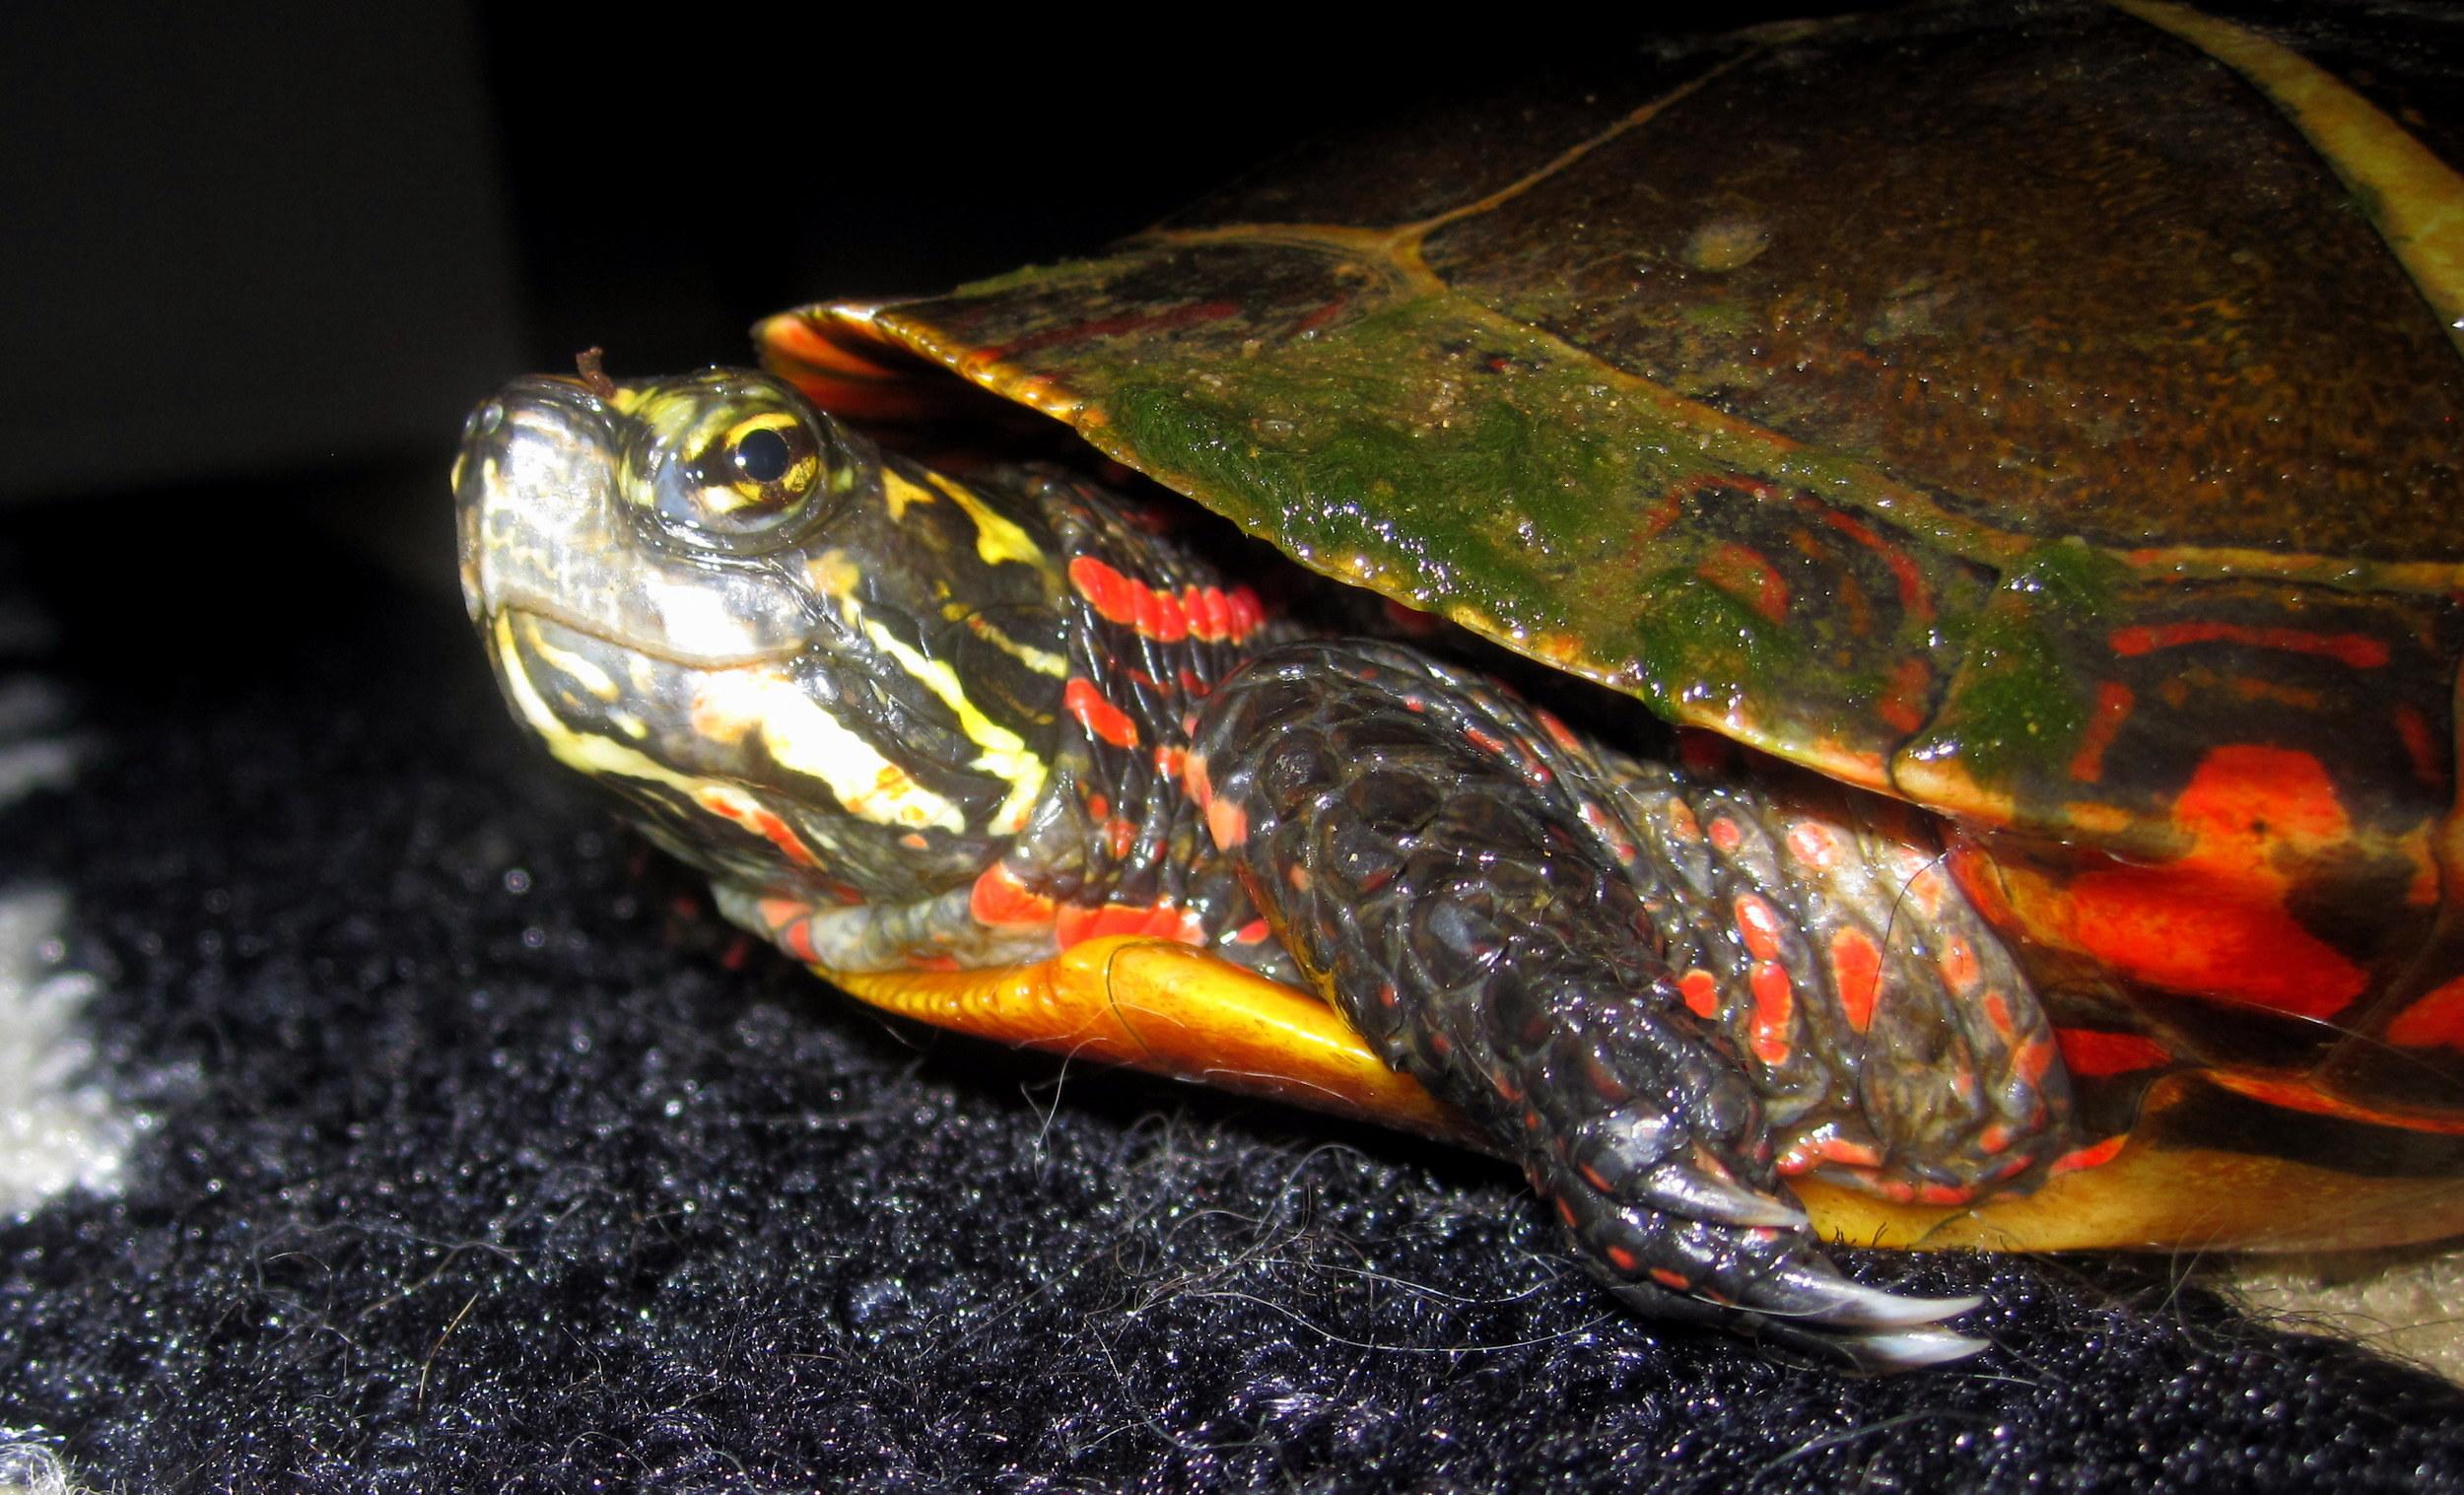 Doesn't Gaheris the Turtle look just a bit... evil?